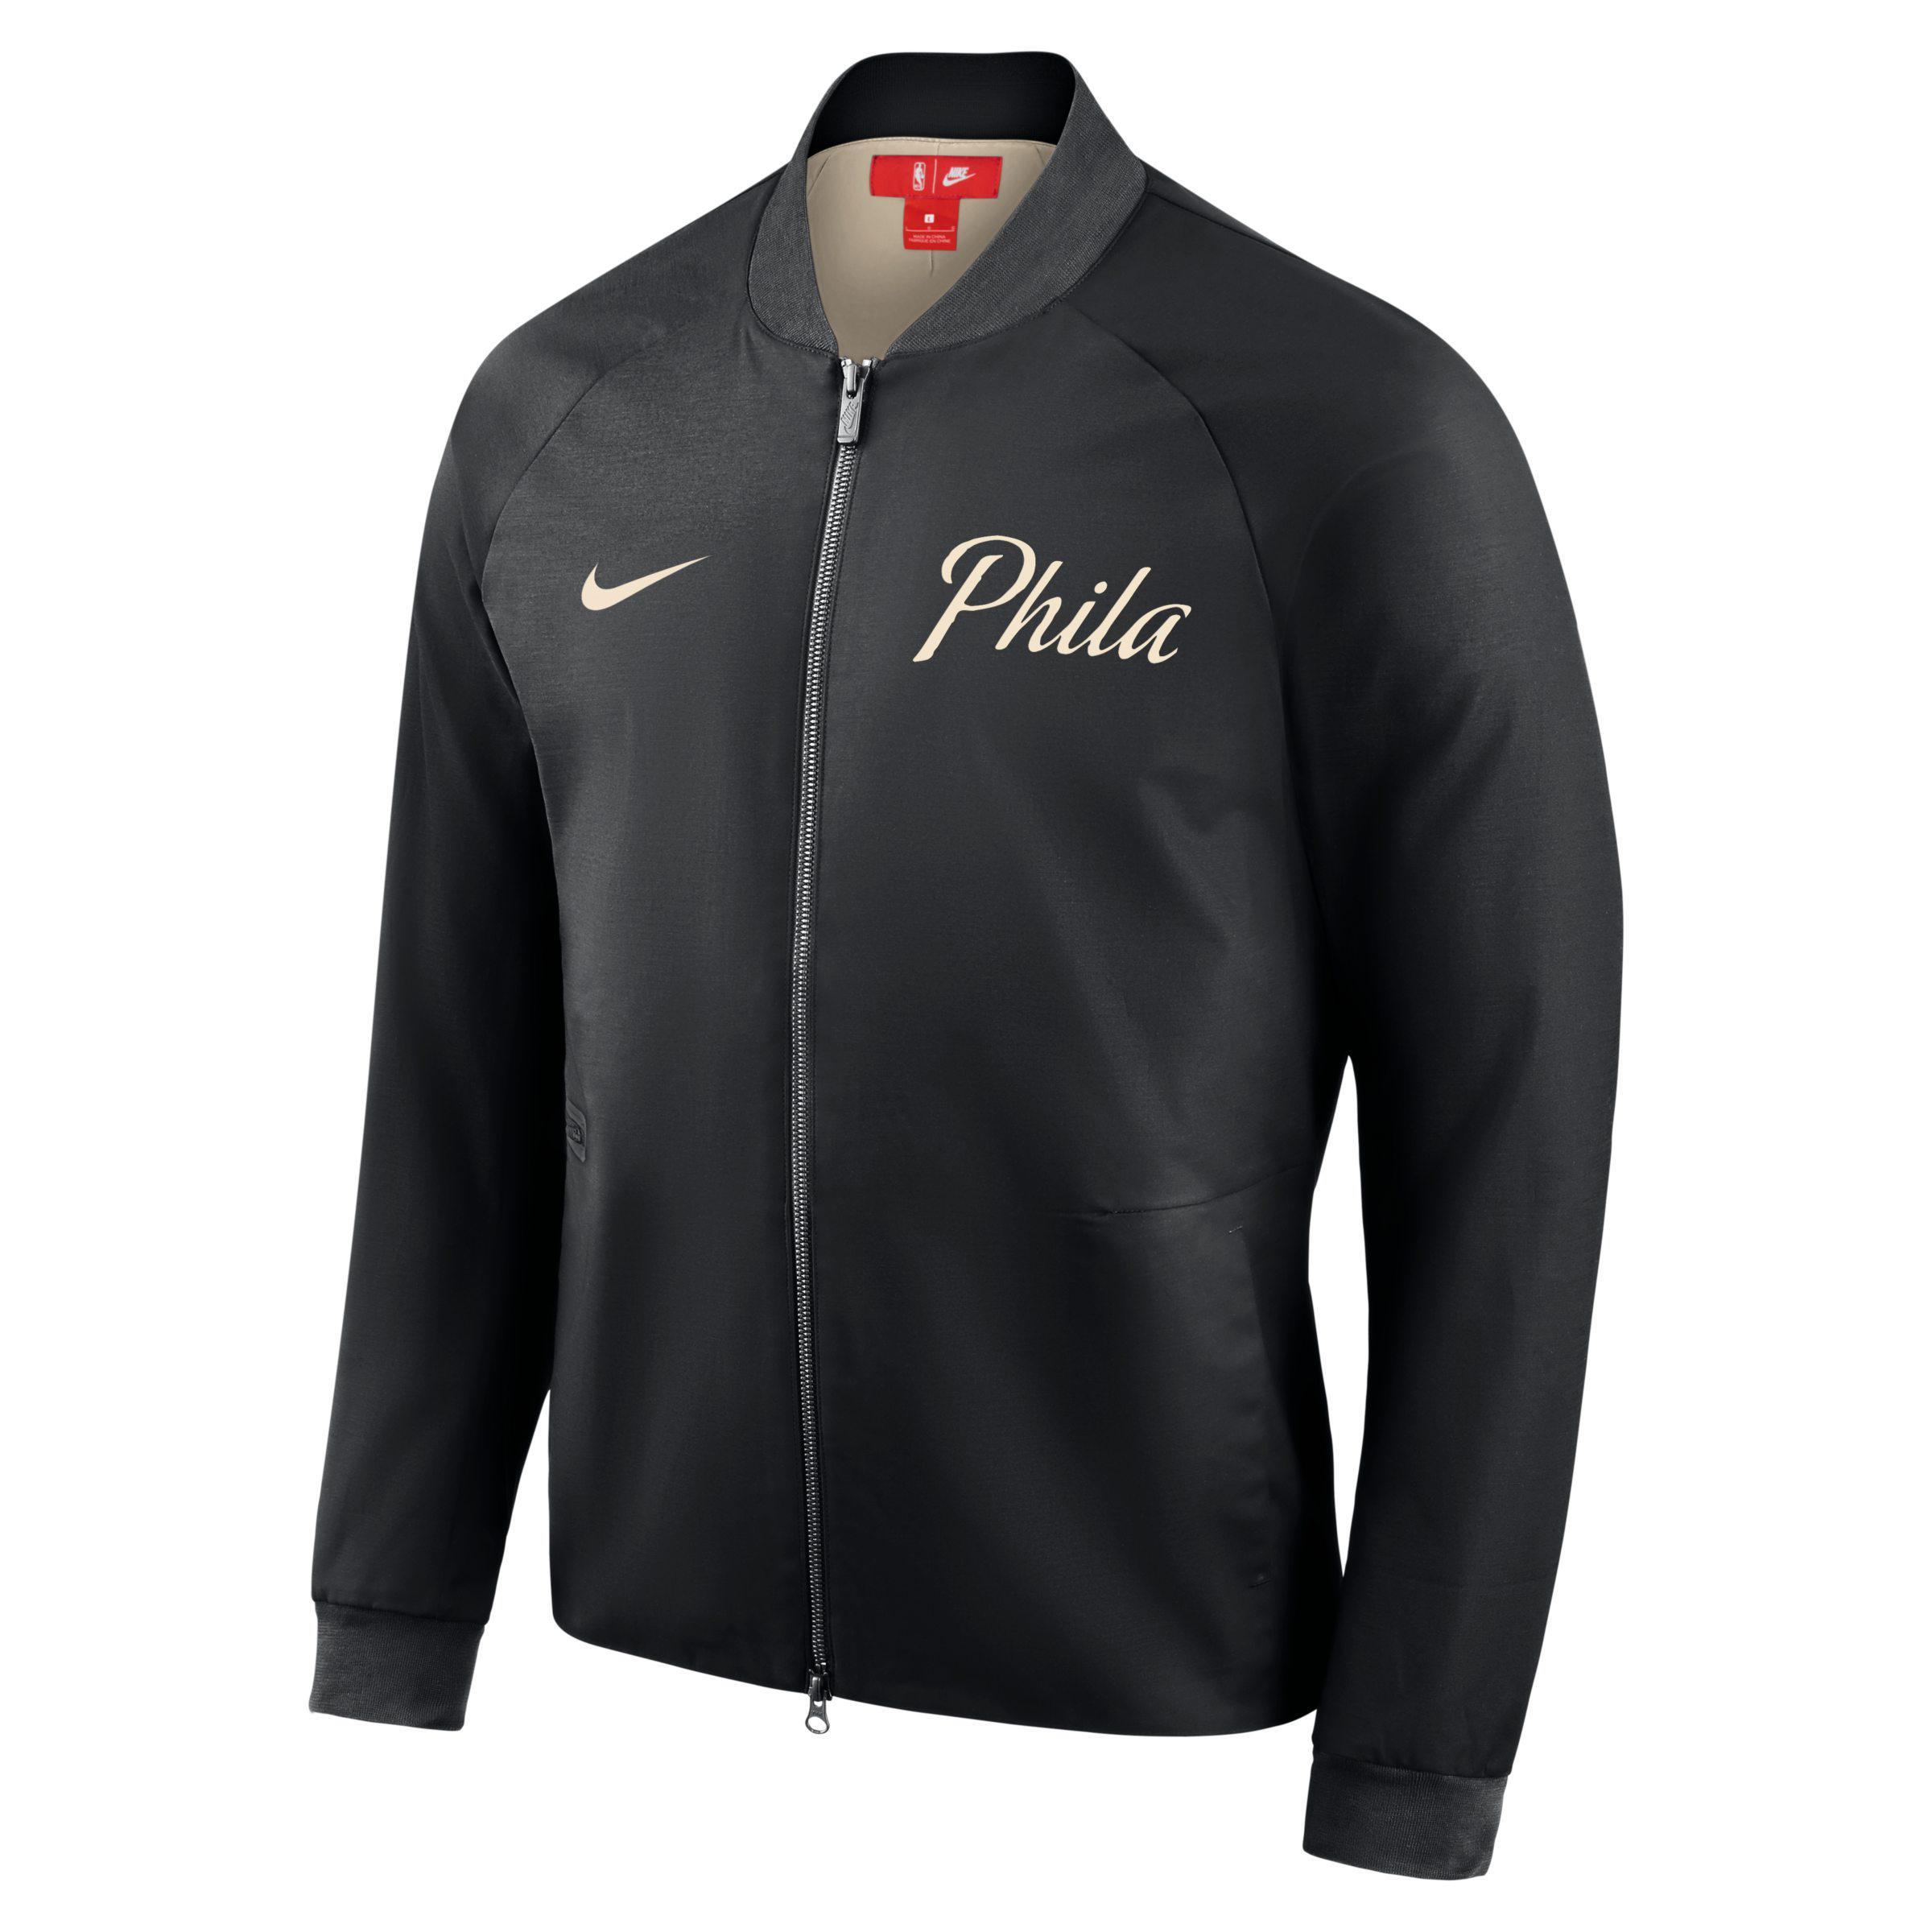 ed62f9e8e51 Nike Philadelphia 76ers City Edition Modern Nba Varsity Jacket in ...